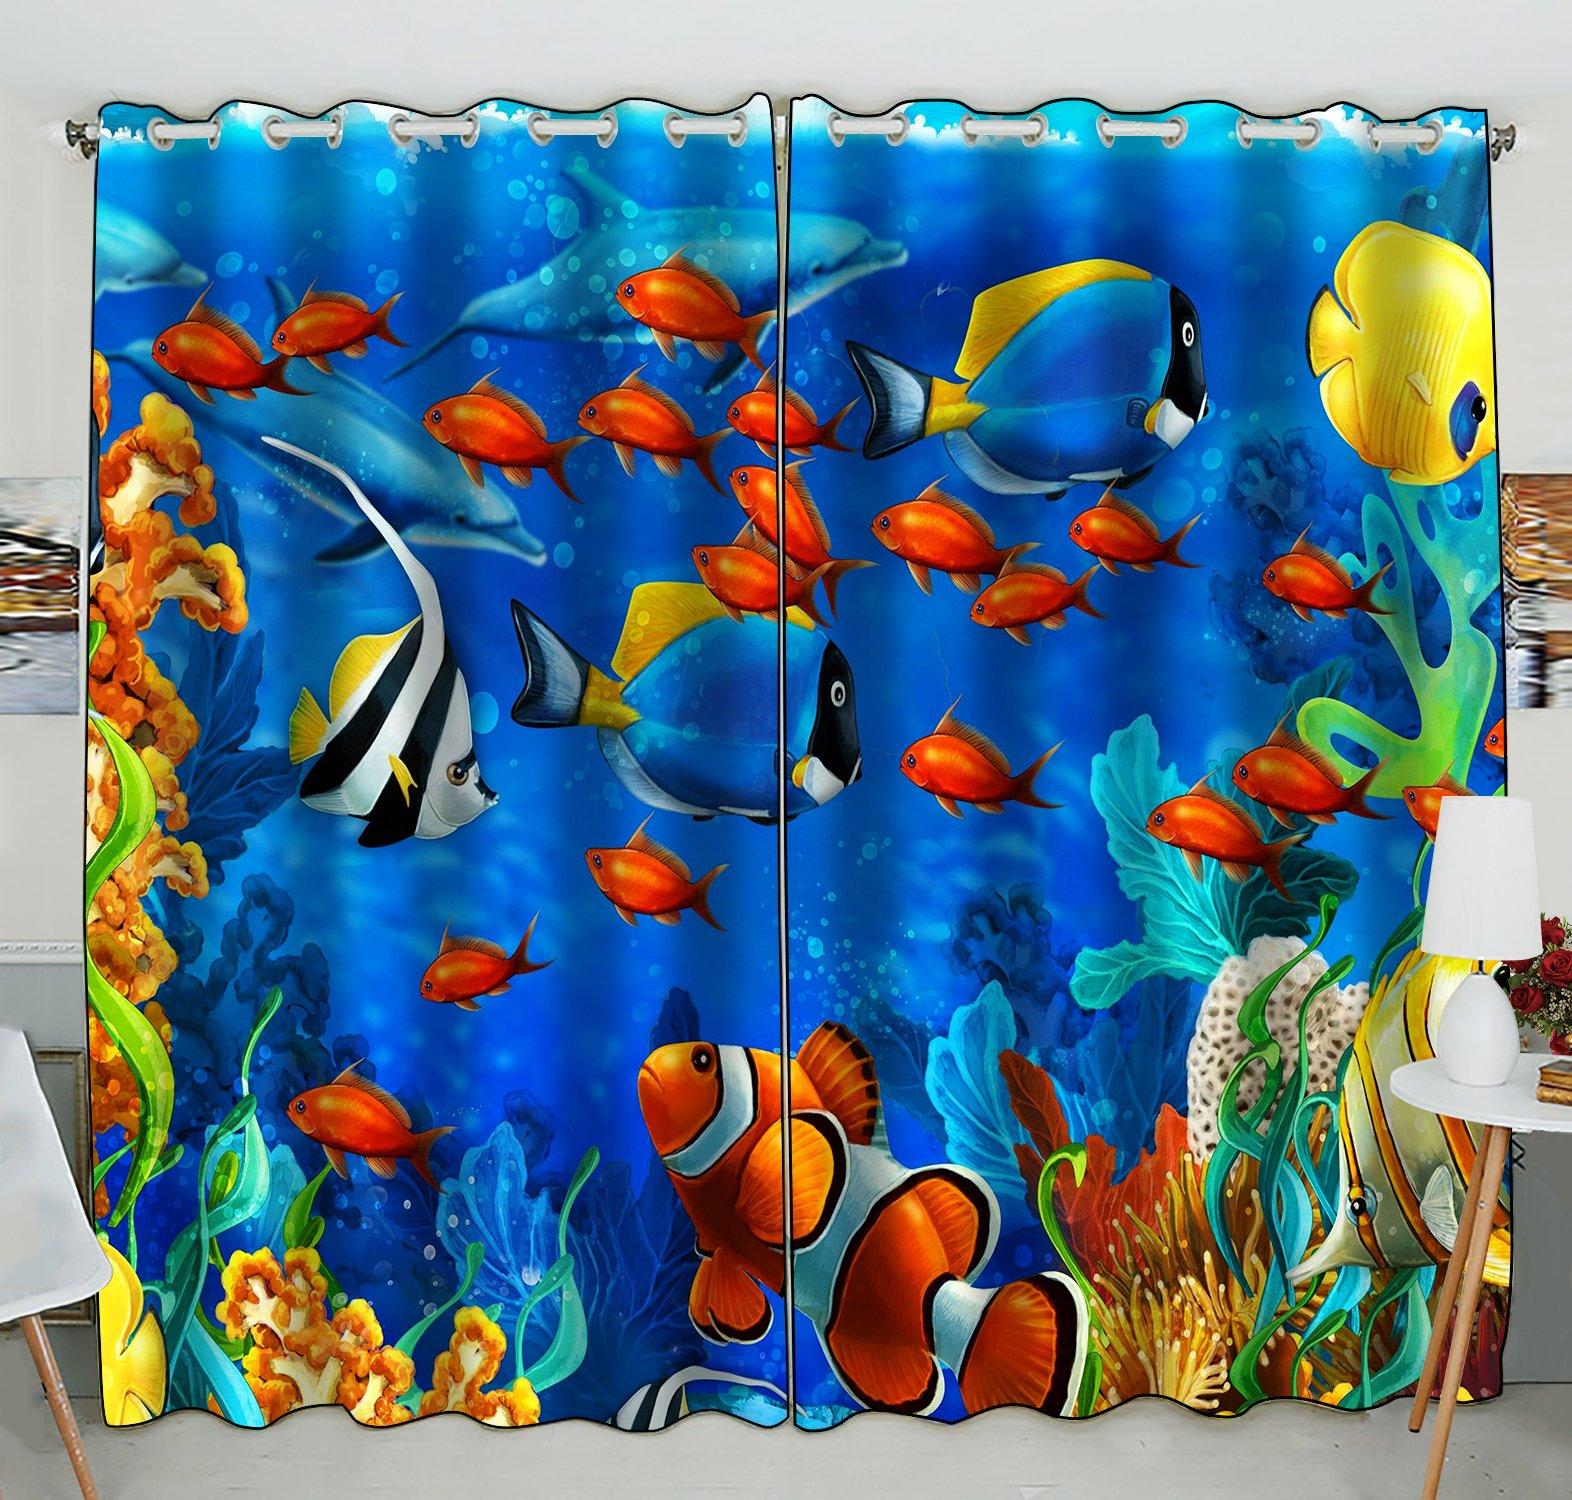 Custom Sea World Window Curtain,Underwater World Ocean Animals Fish Coral Grommet Blackout Curtain Room Darkening Curtains Bedroom Kitchen Size 52(W) x 84(H) inches (Two Piece)